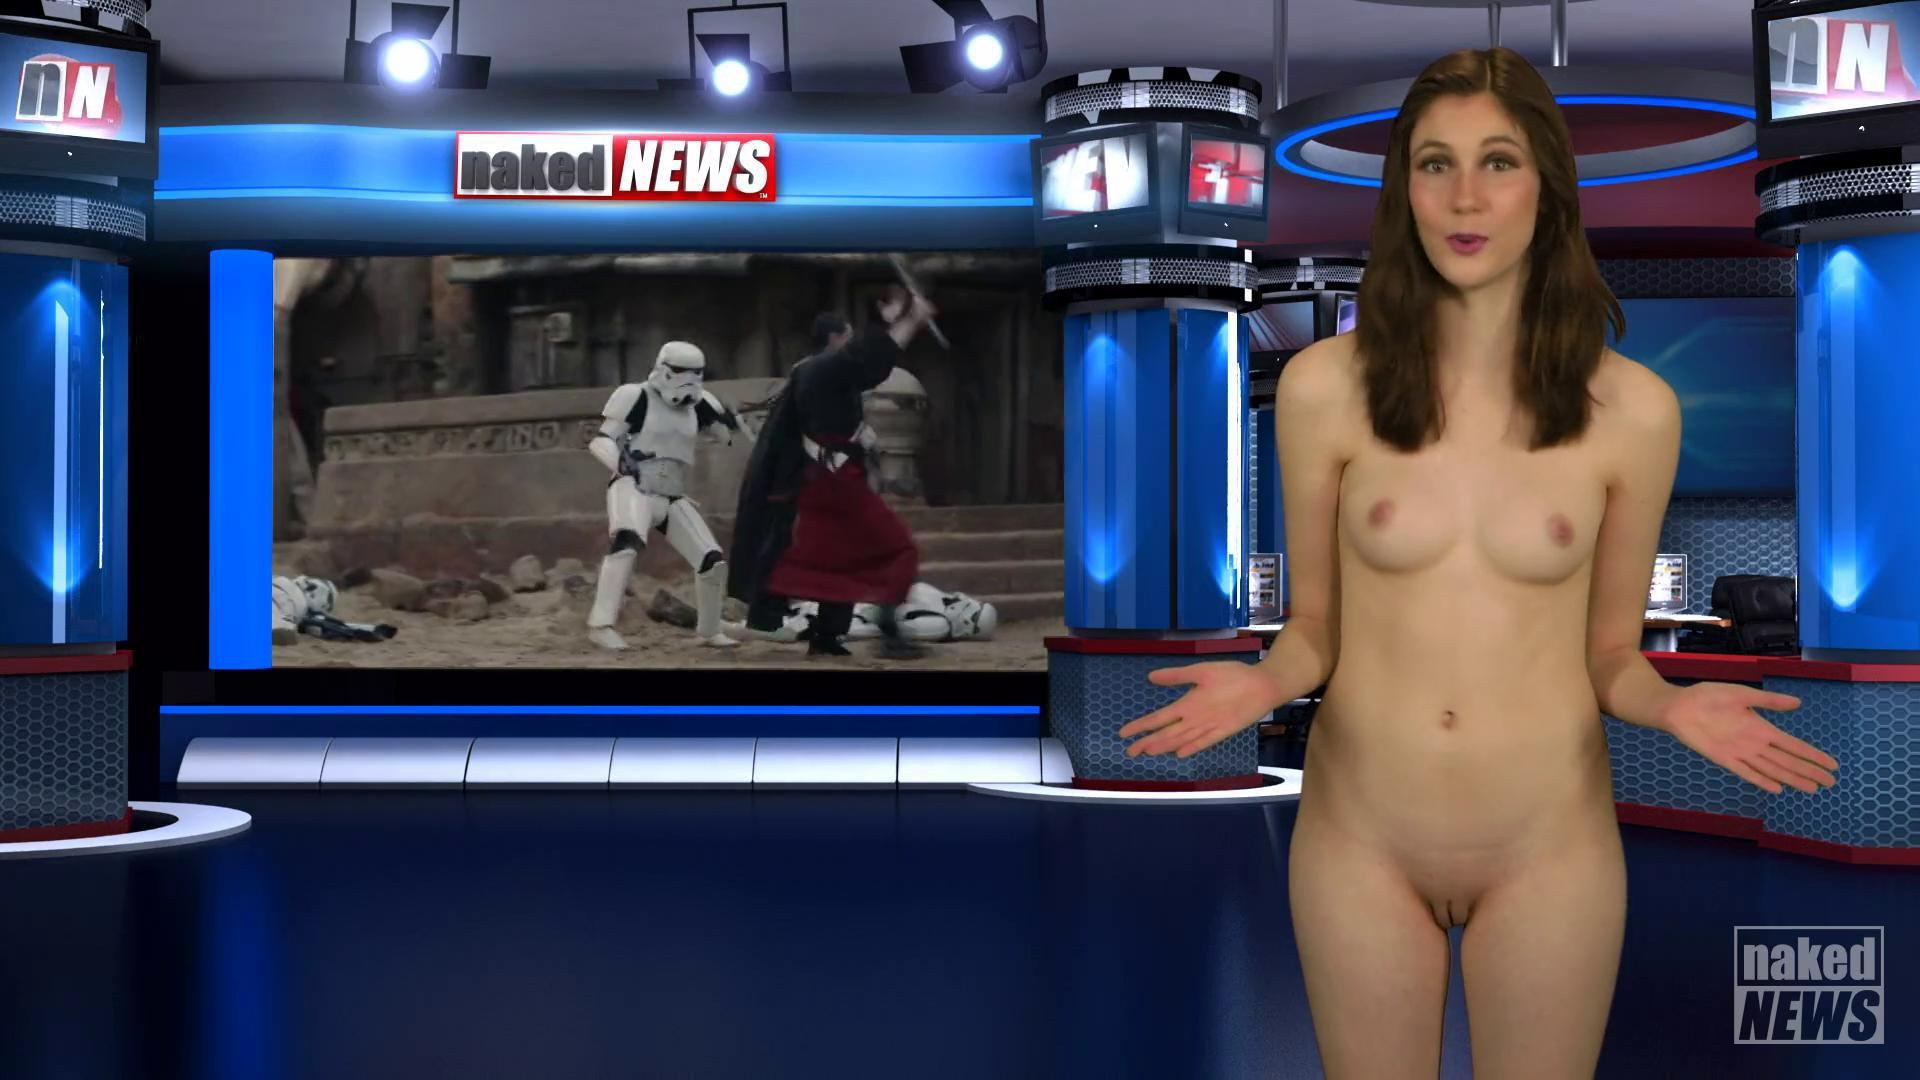 Naked news passwords — photo 14